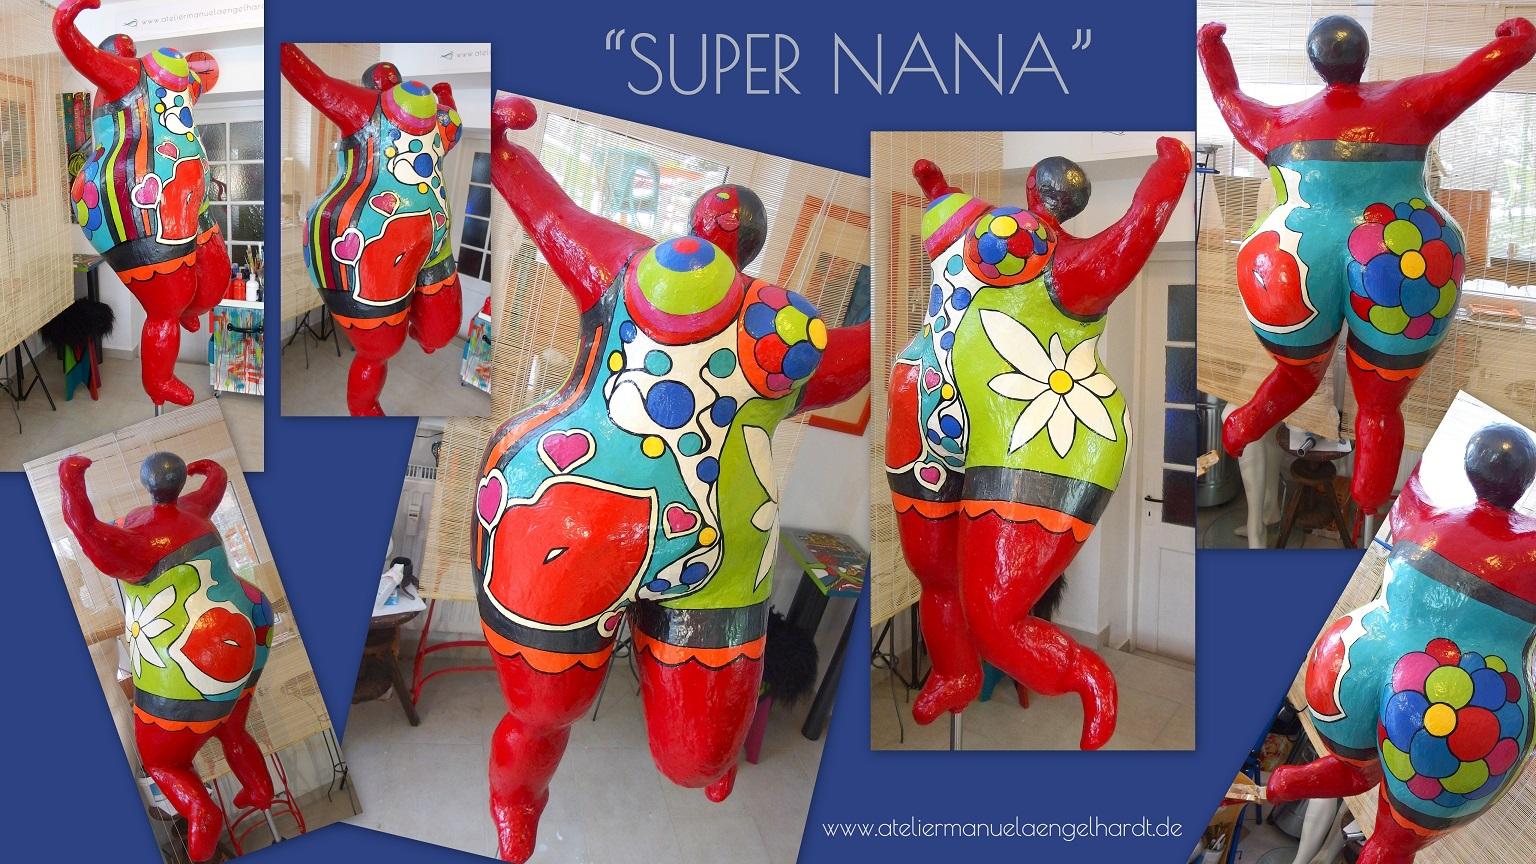 Outdoor Figur Super Nana Kunst Design Artboxmunich